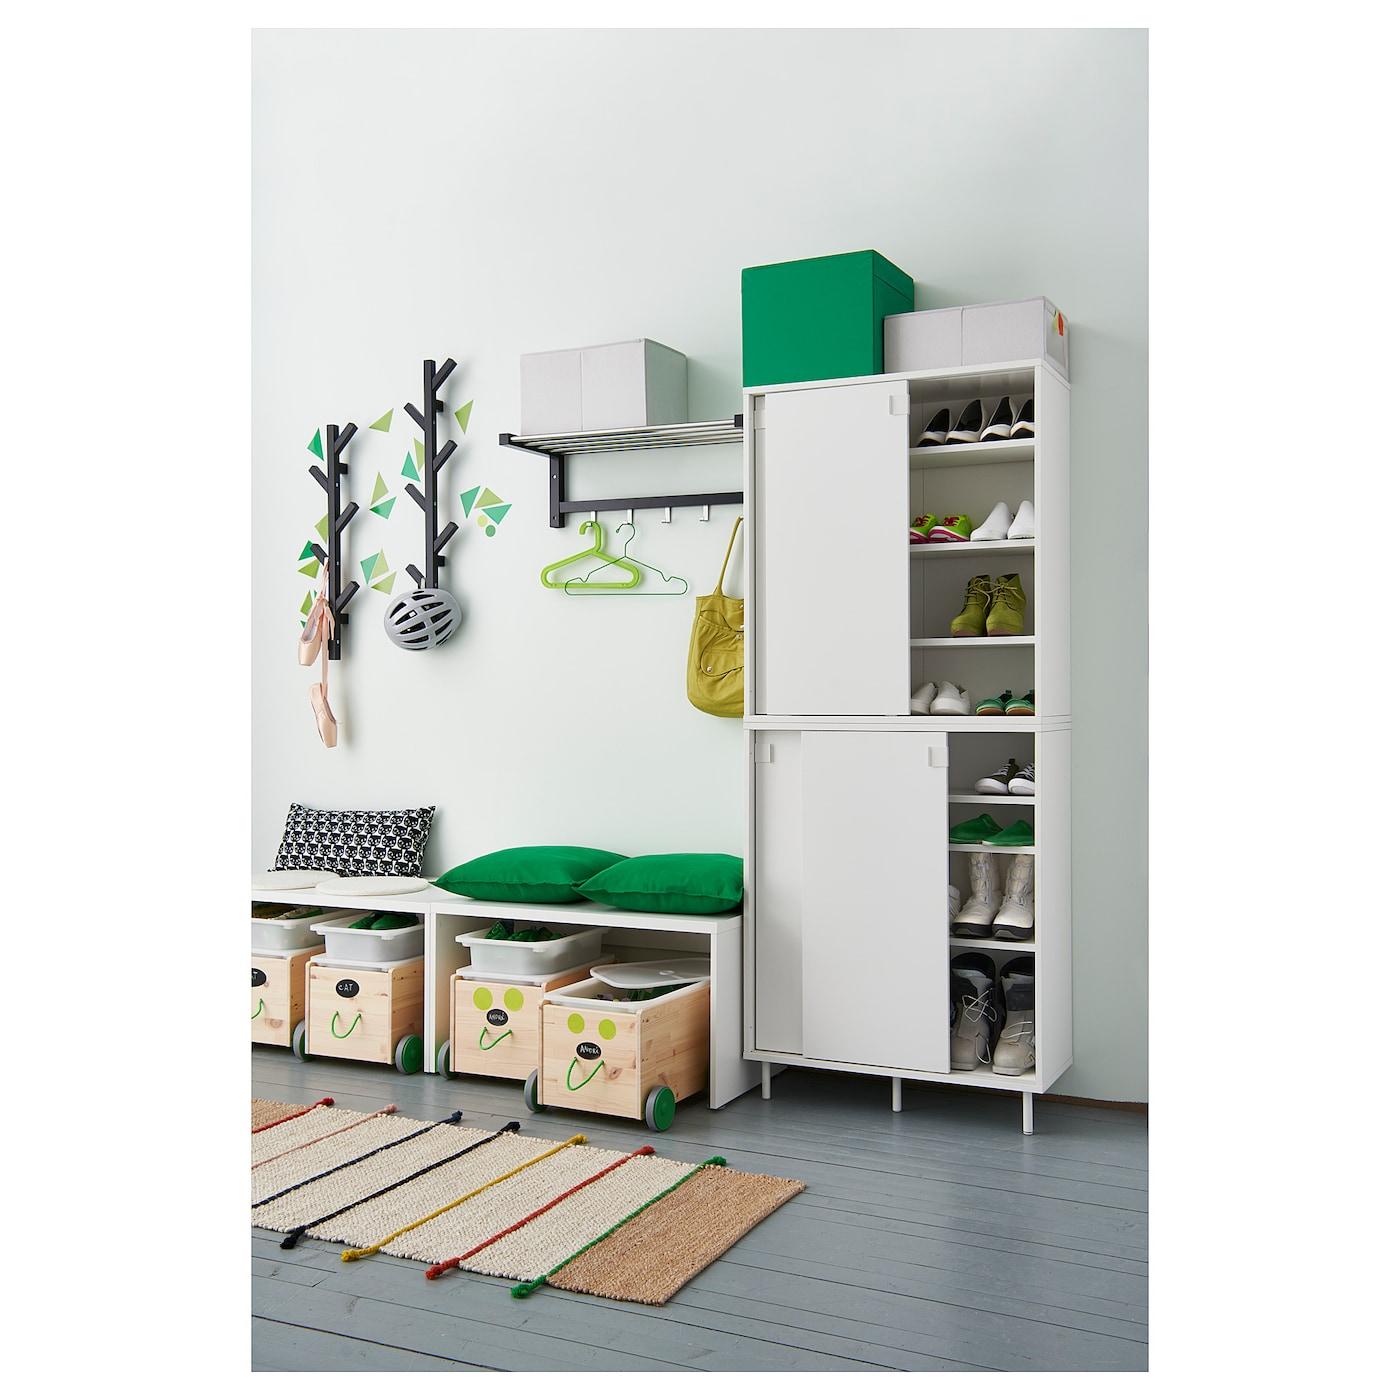 mackap r armoire chaussures rangement 80 x 102 cm ikea. Black Bedroom Furniture Sets. Home Design Ideas